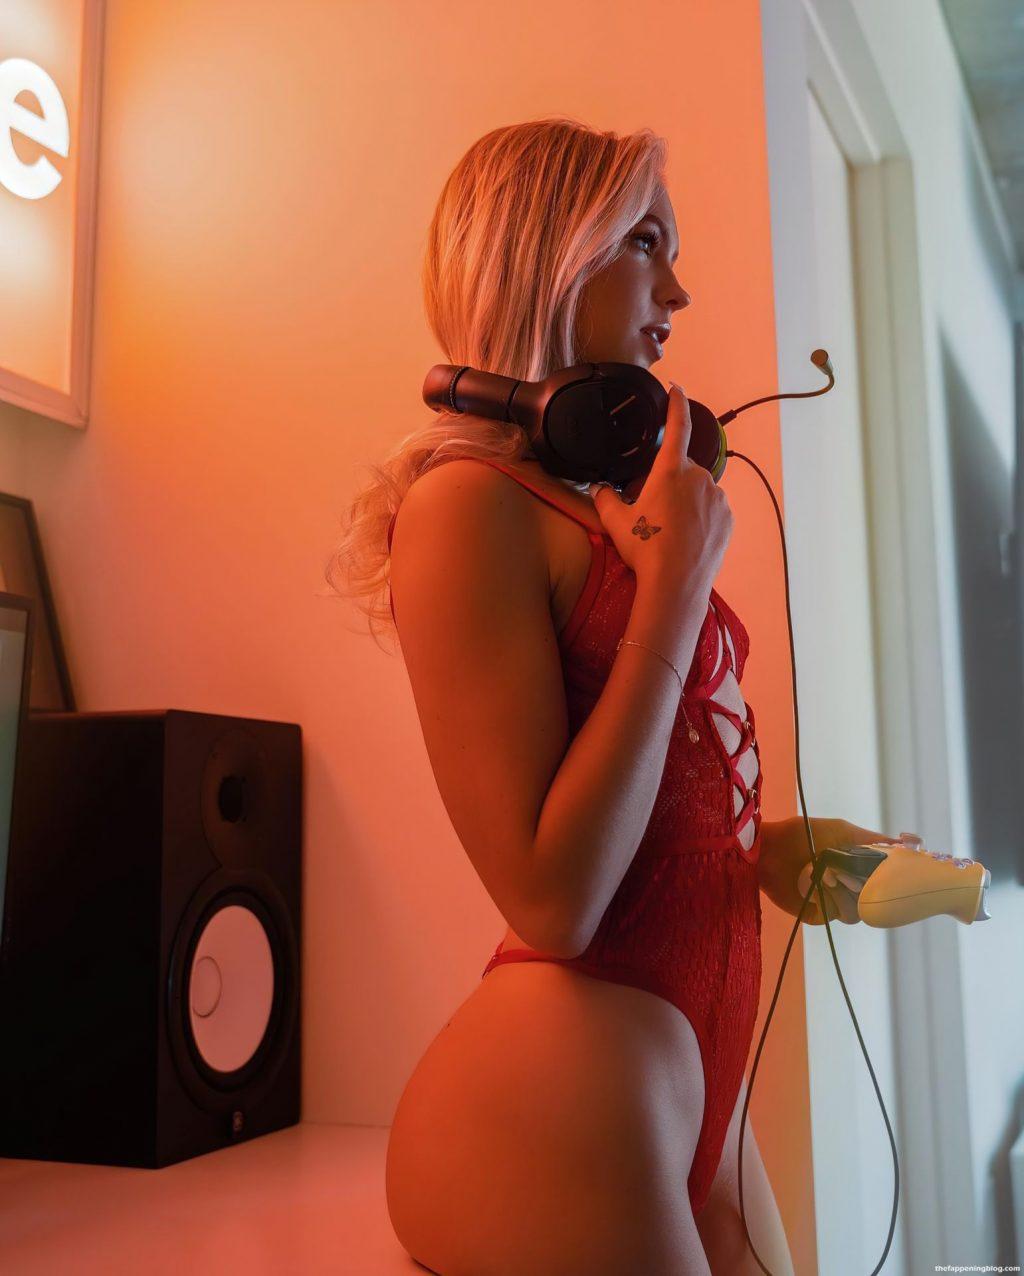 Jordyn Jones Look Sexy in Red Lingerie (10 Photos + Video)